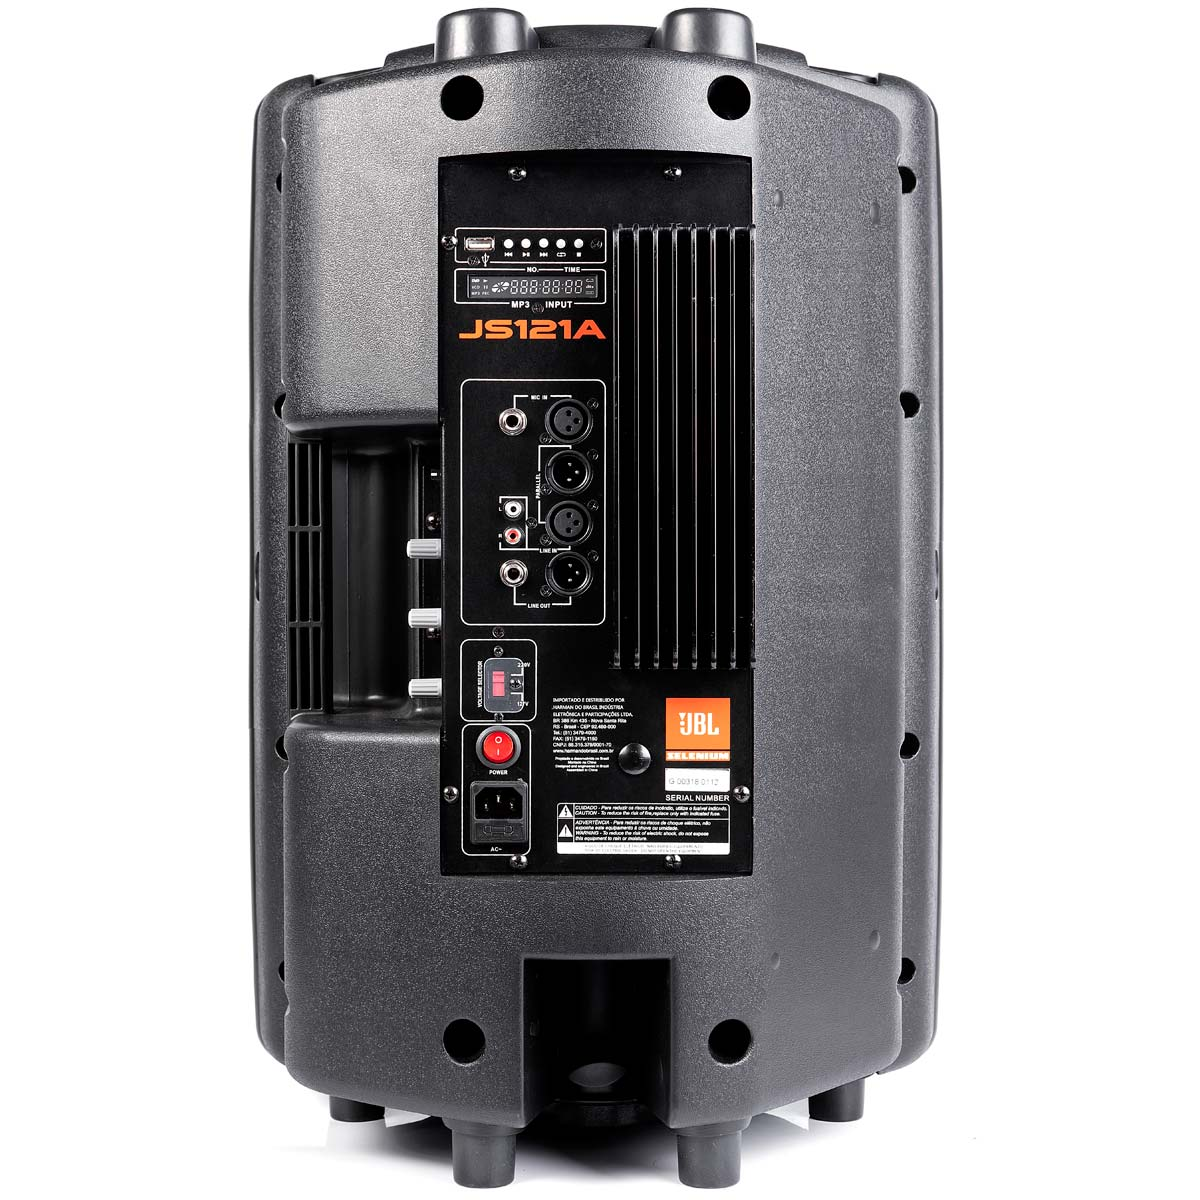 Caixa Ativa 150W c/ Player USB JS 121 A - JBL